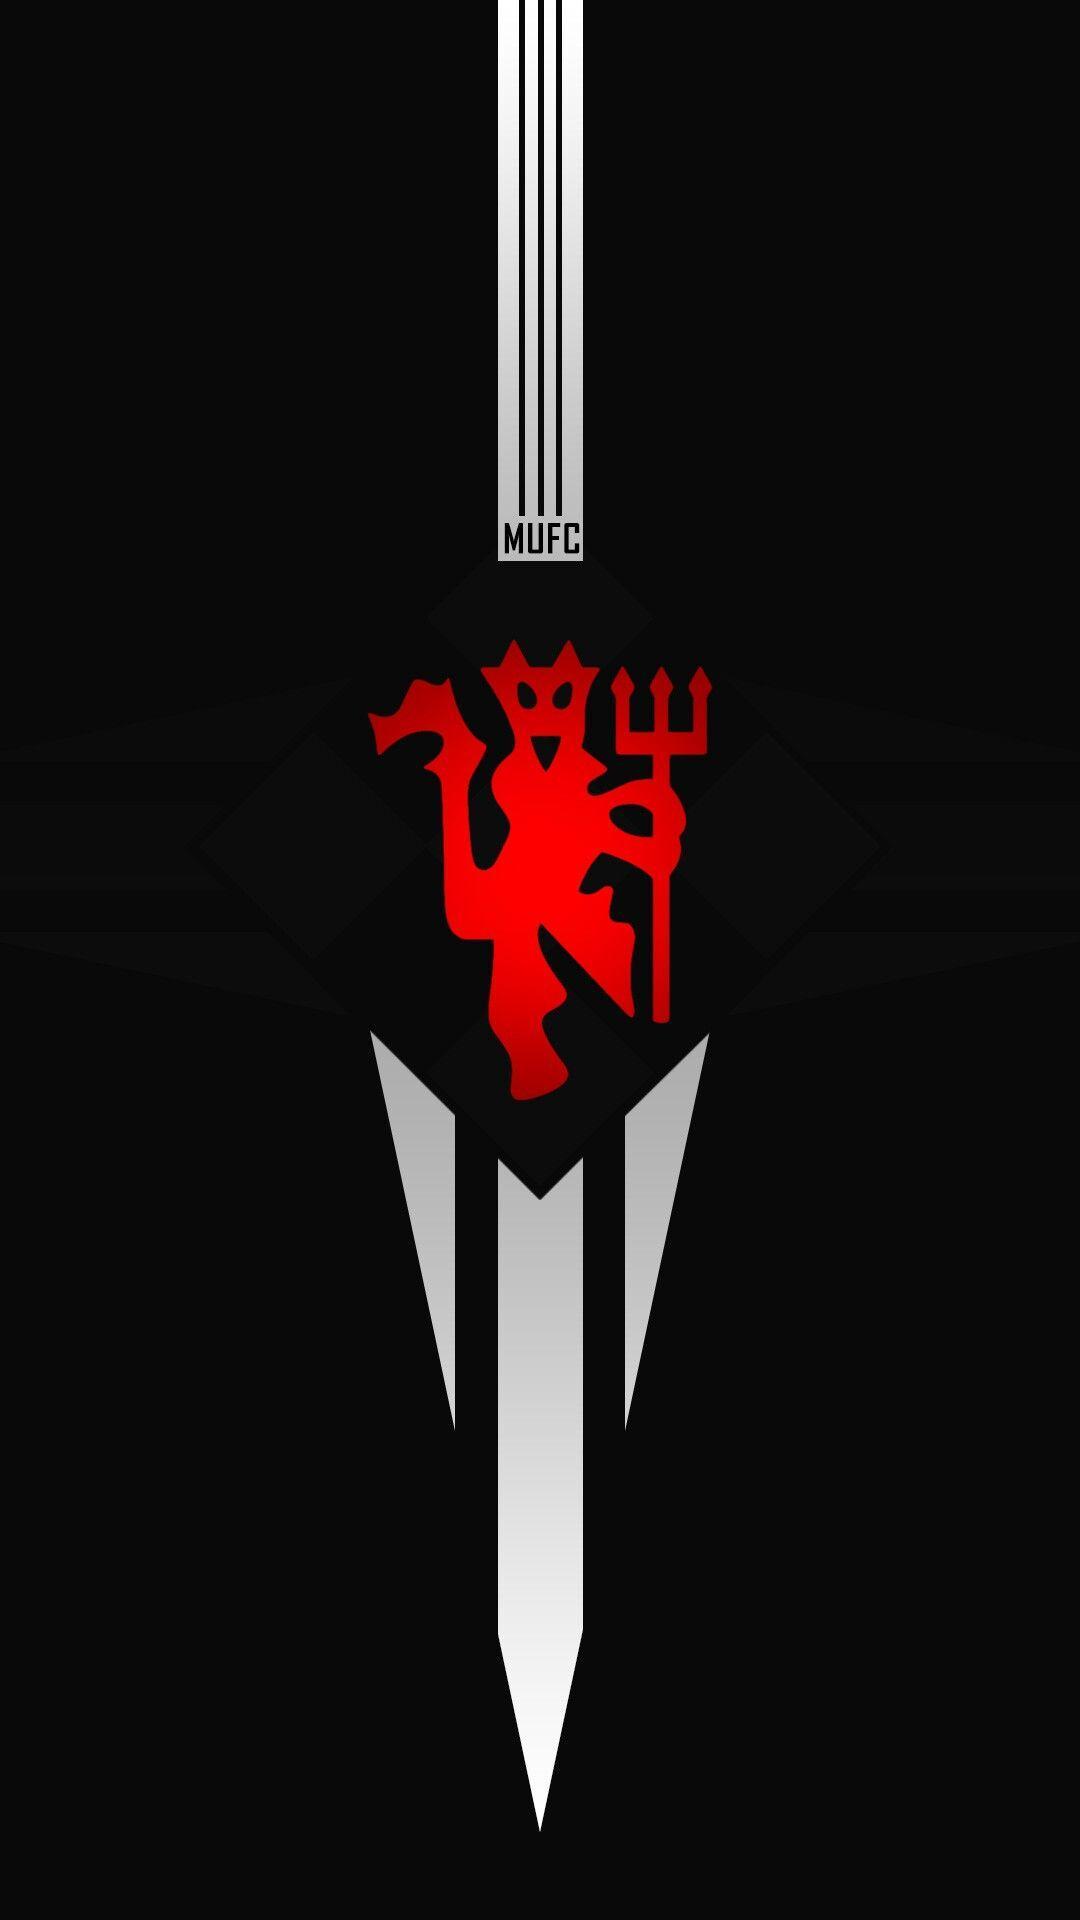 Manchester United Wallpaper Hd 2015